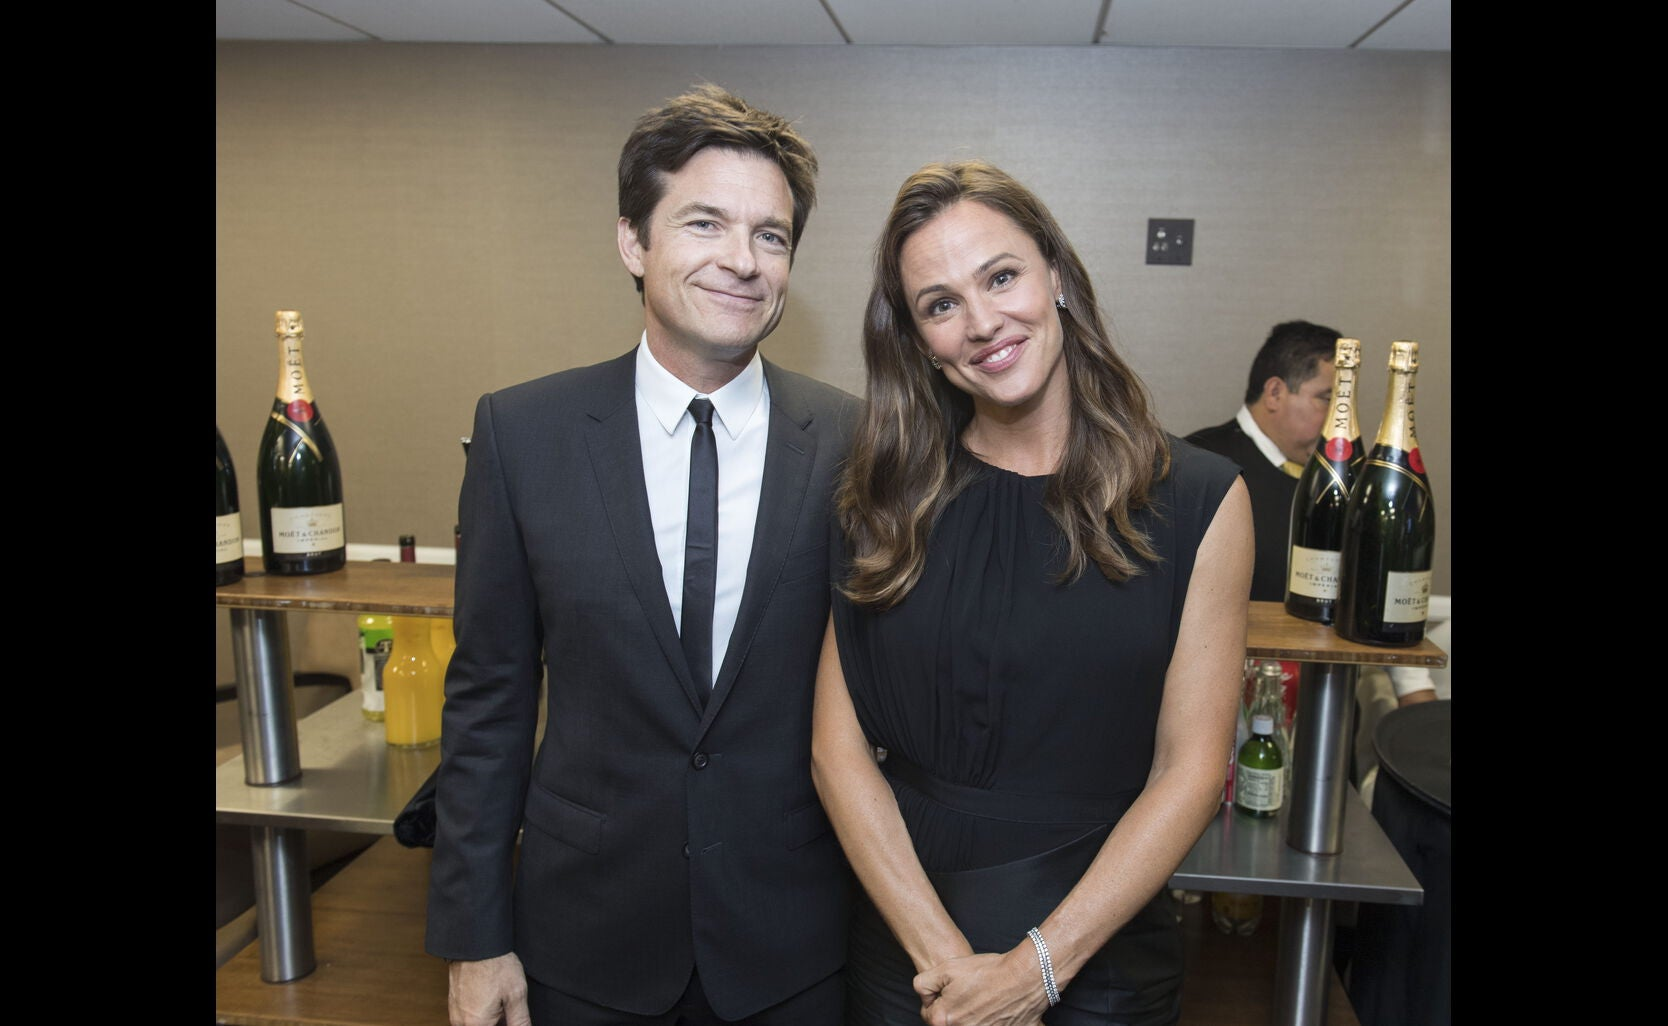 Jennifer Gardner and Jason Bateman